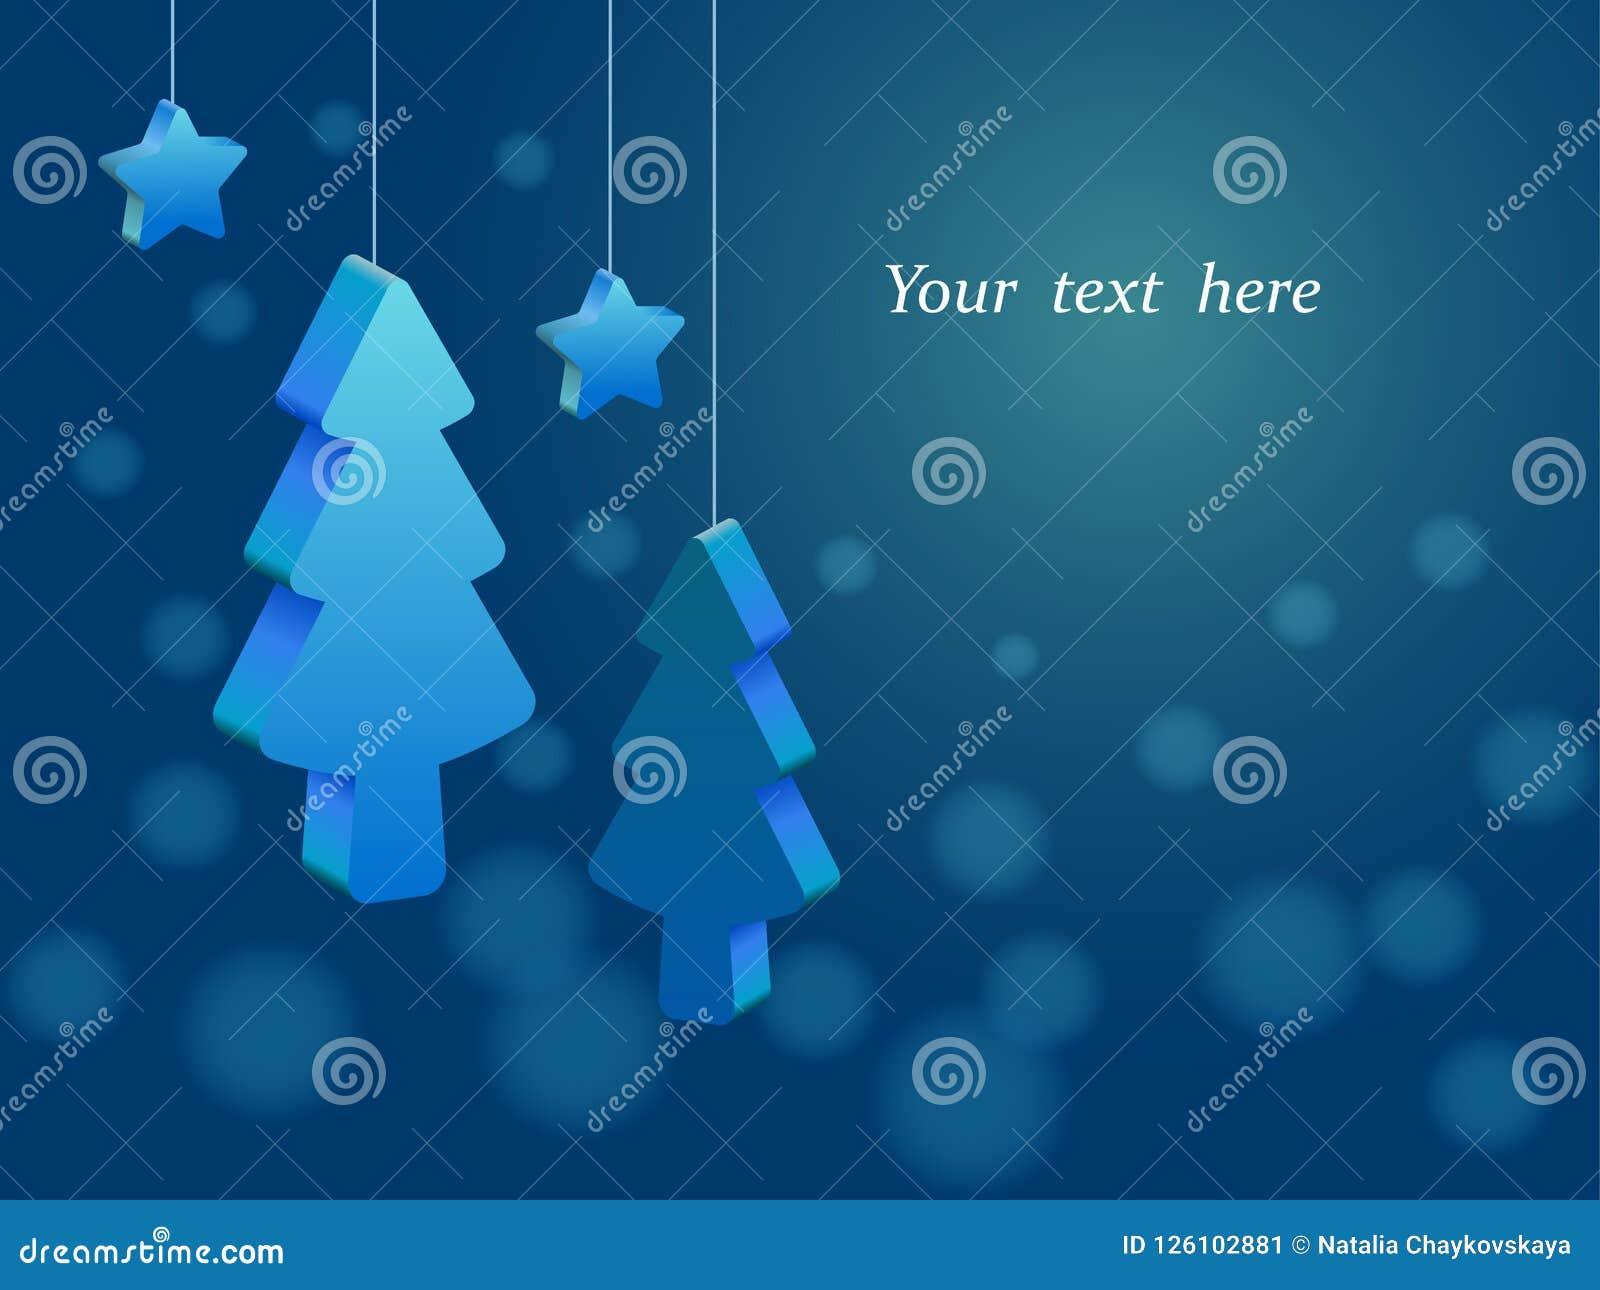 Árvores de Natal tridimensionais e estrelas que penduram nas cordas, bokeh azul do fundo, lugar para o texto